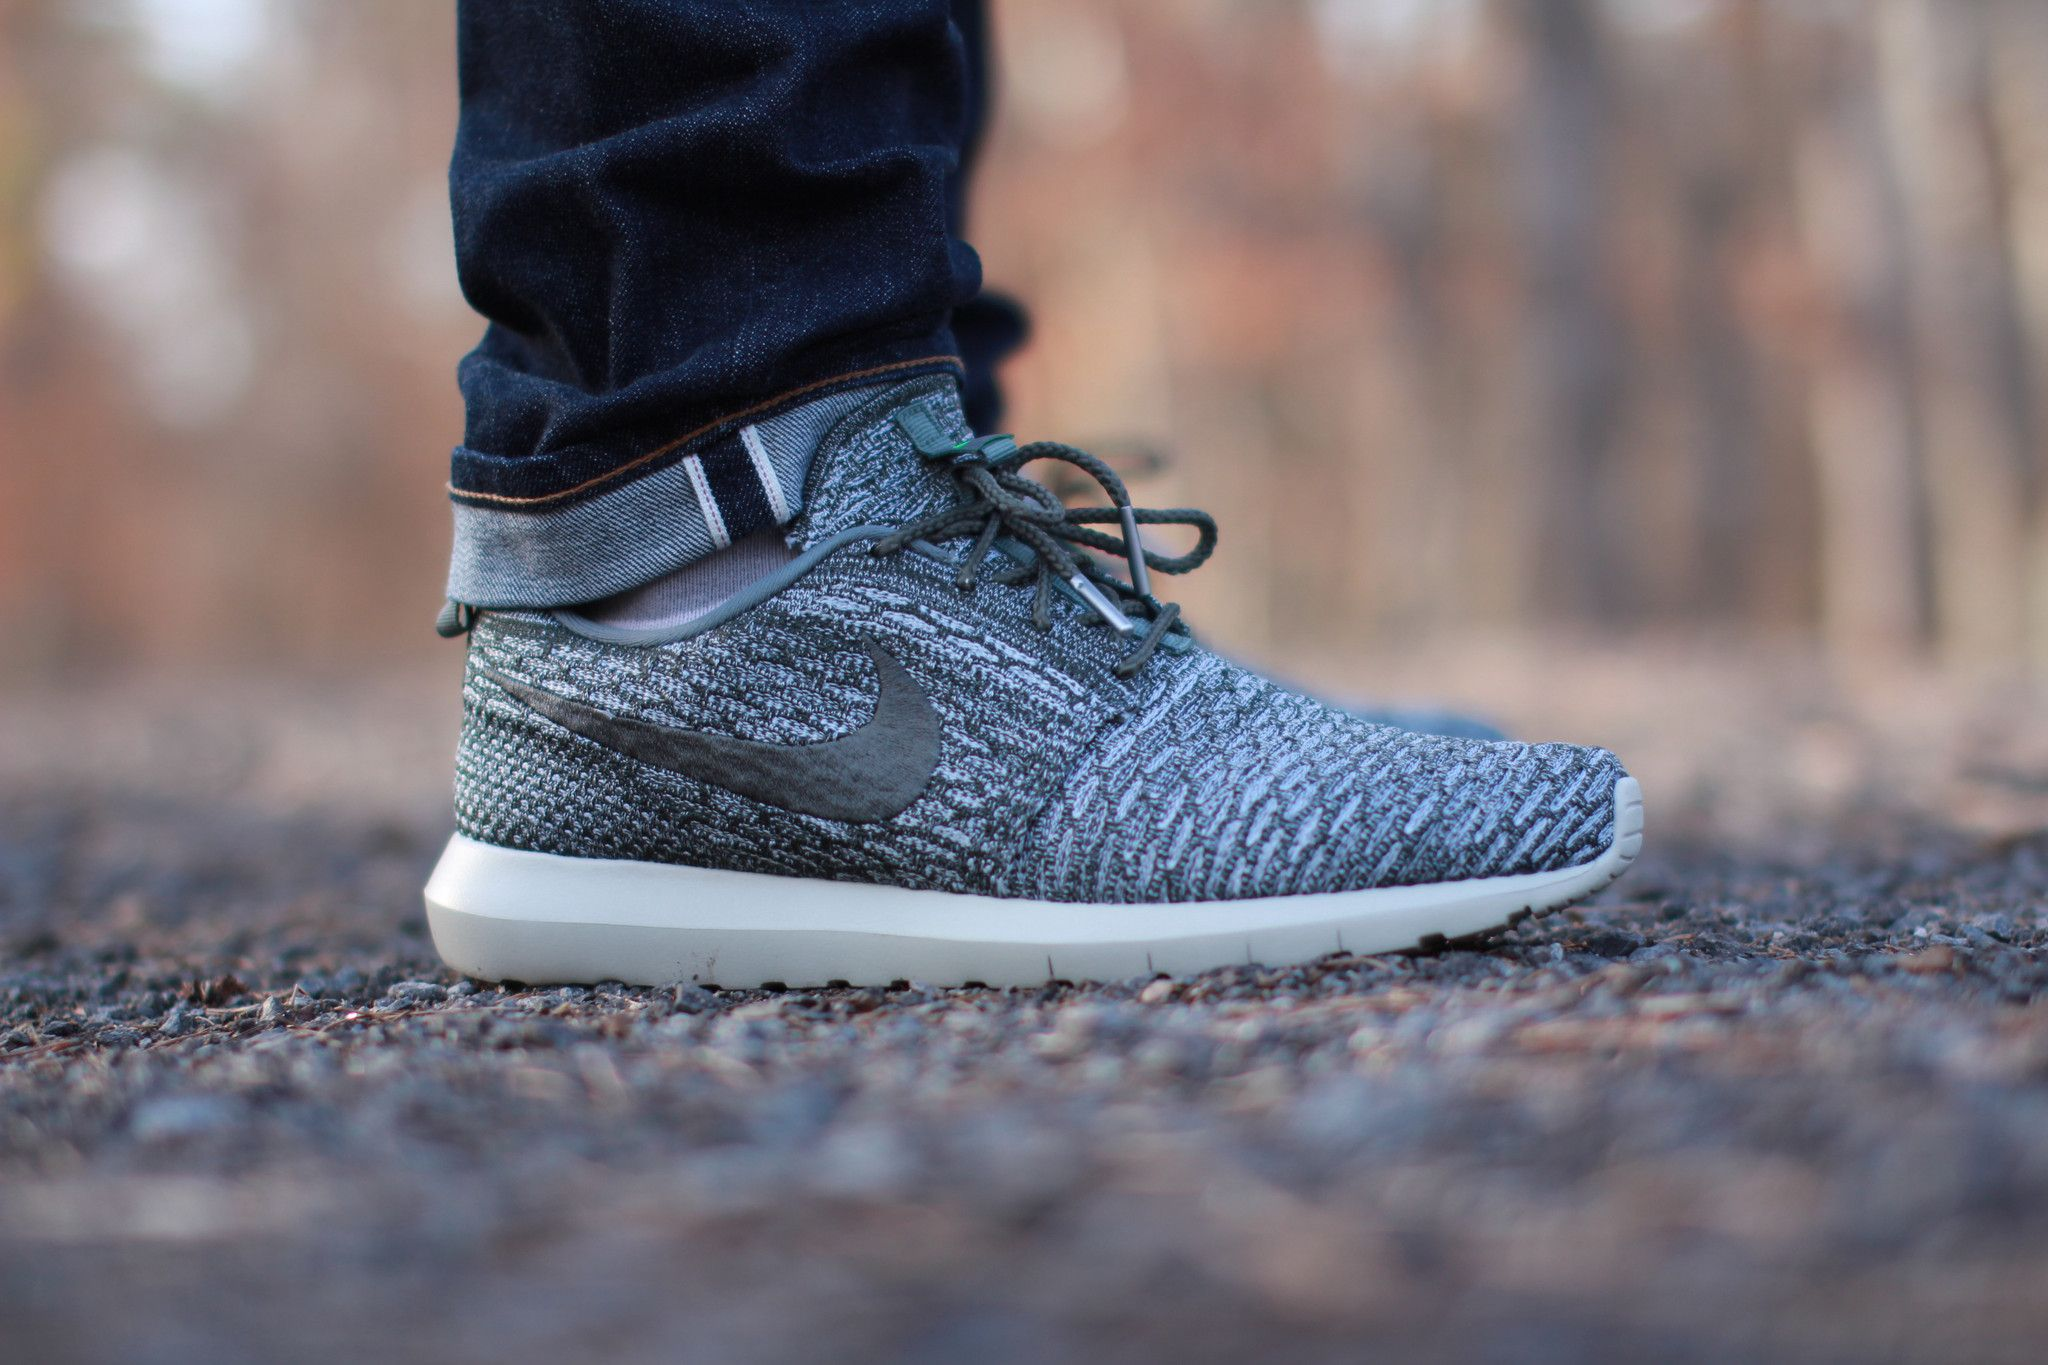 Nike Roshe Run Flyknit Wolf Grey Sequoia